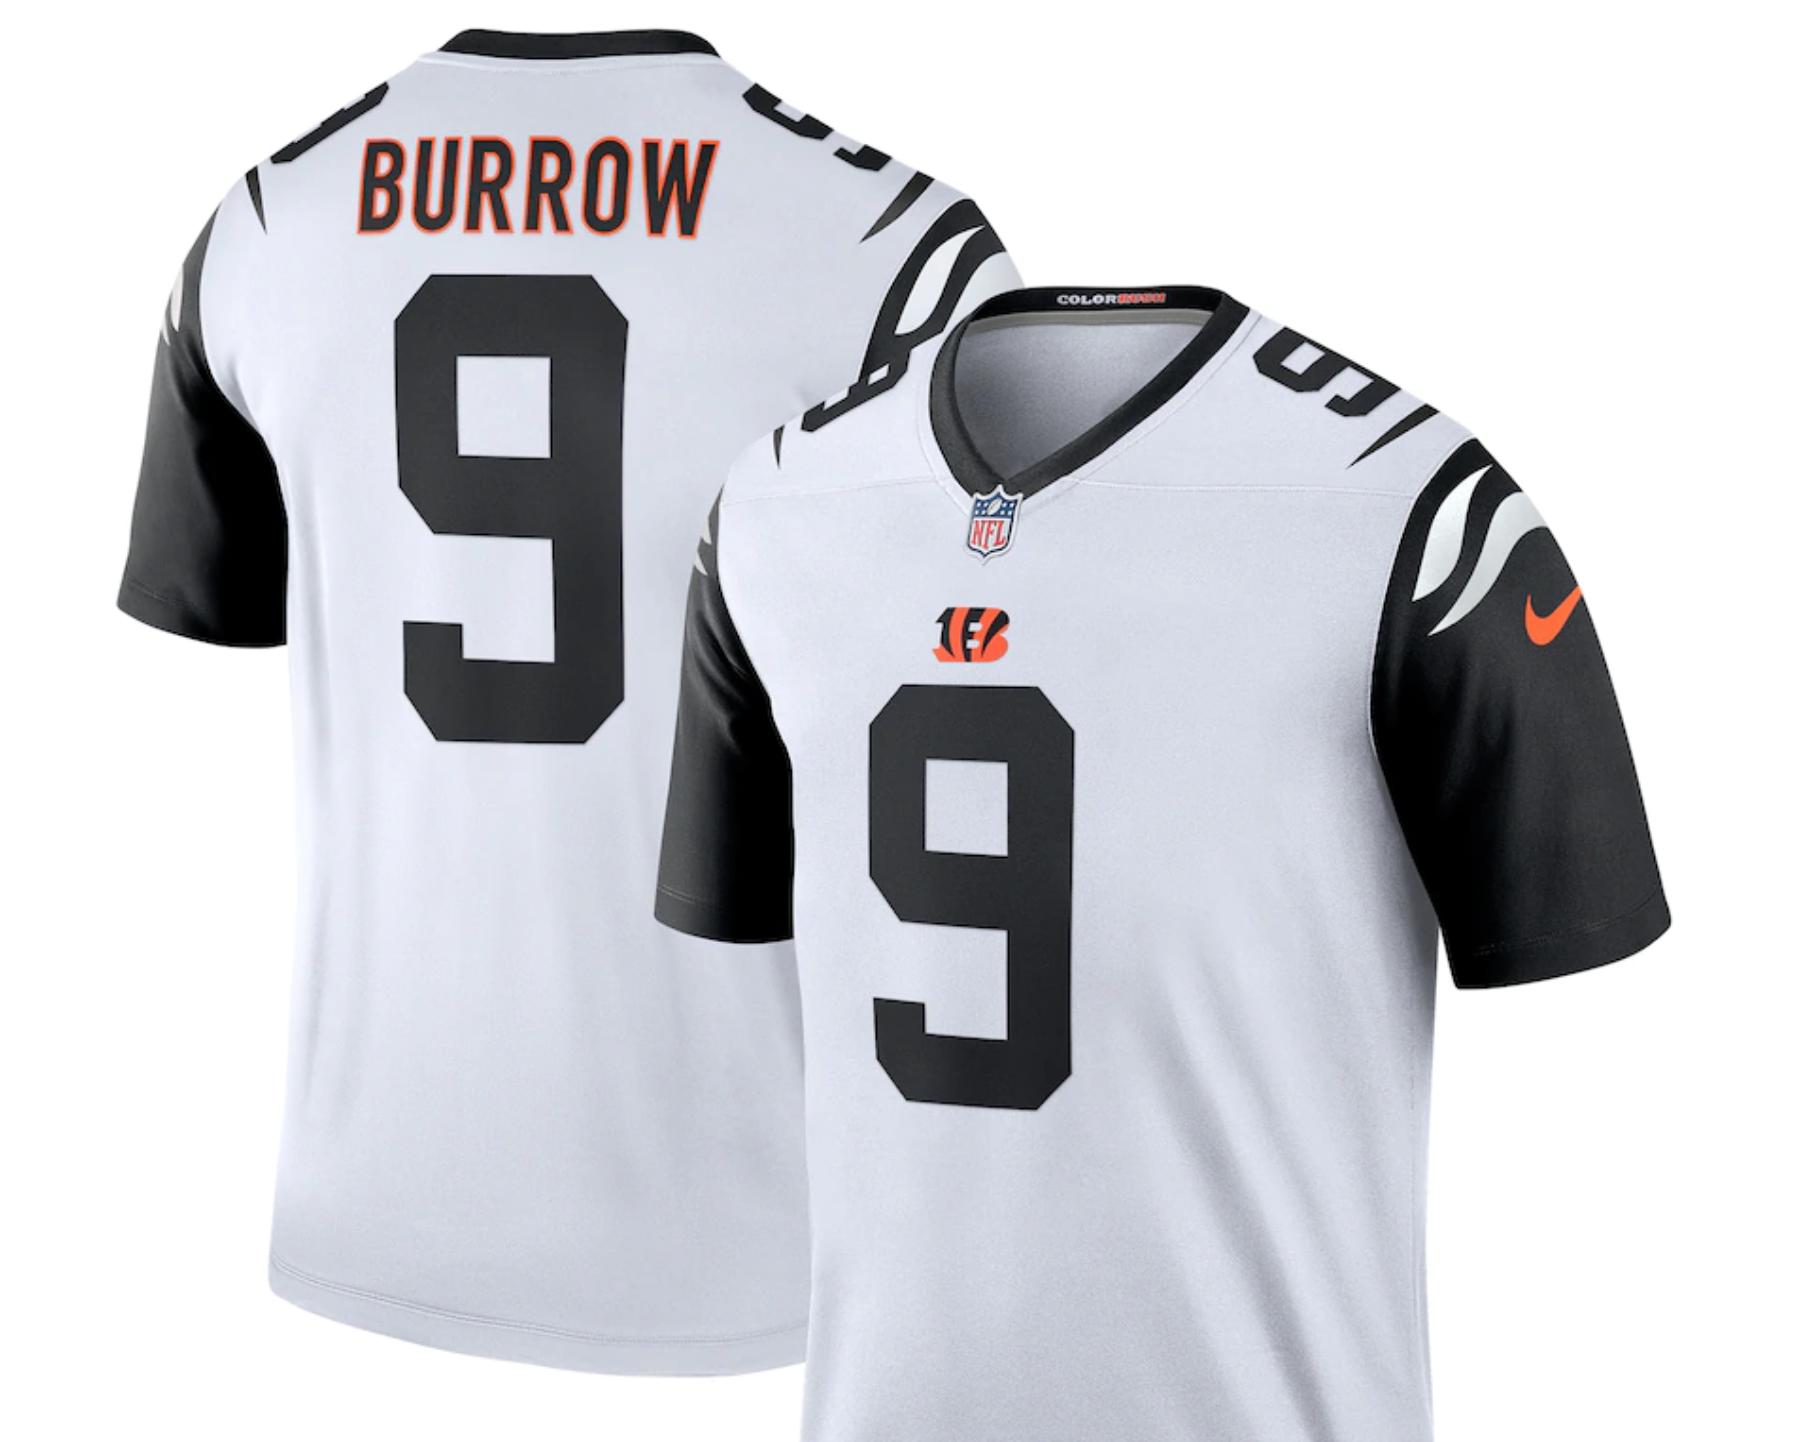 Joe Burrow Jersey, Cincinnati Bengals Jerseys, Where to get them